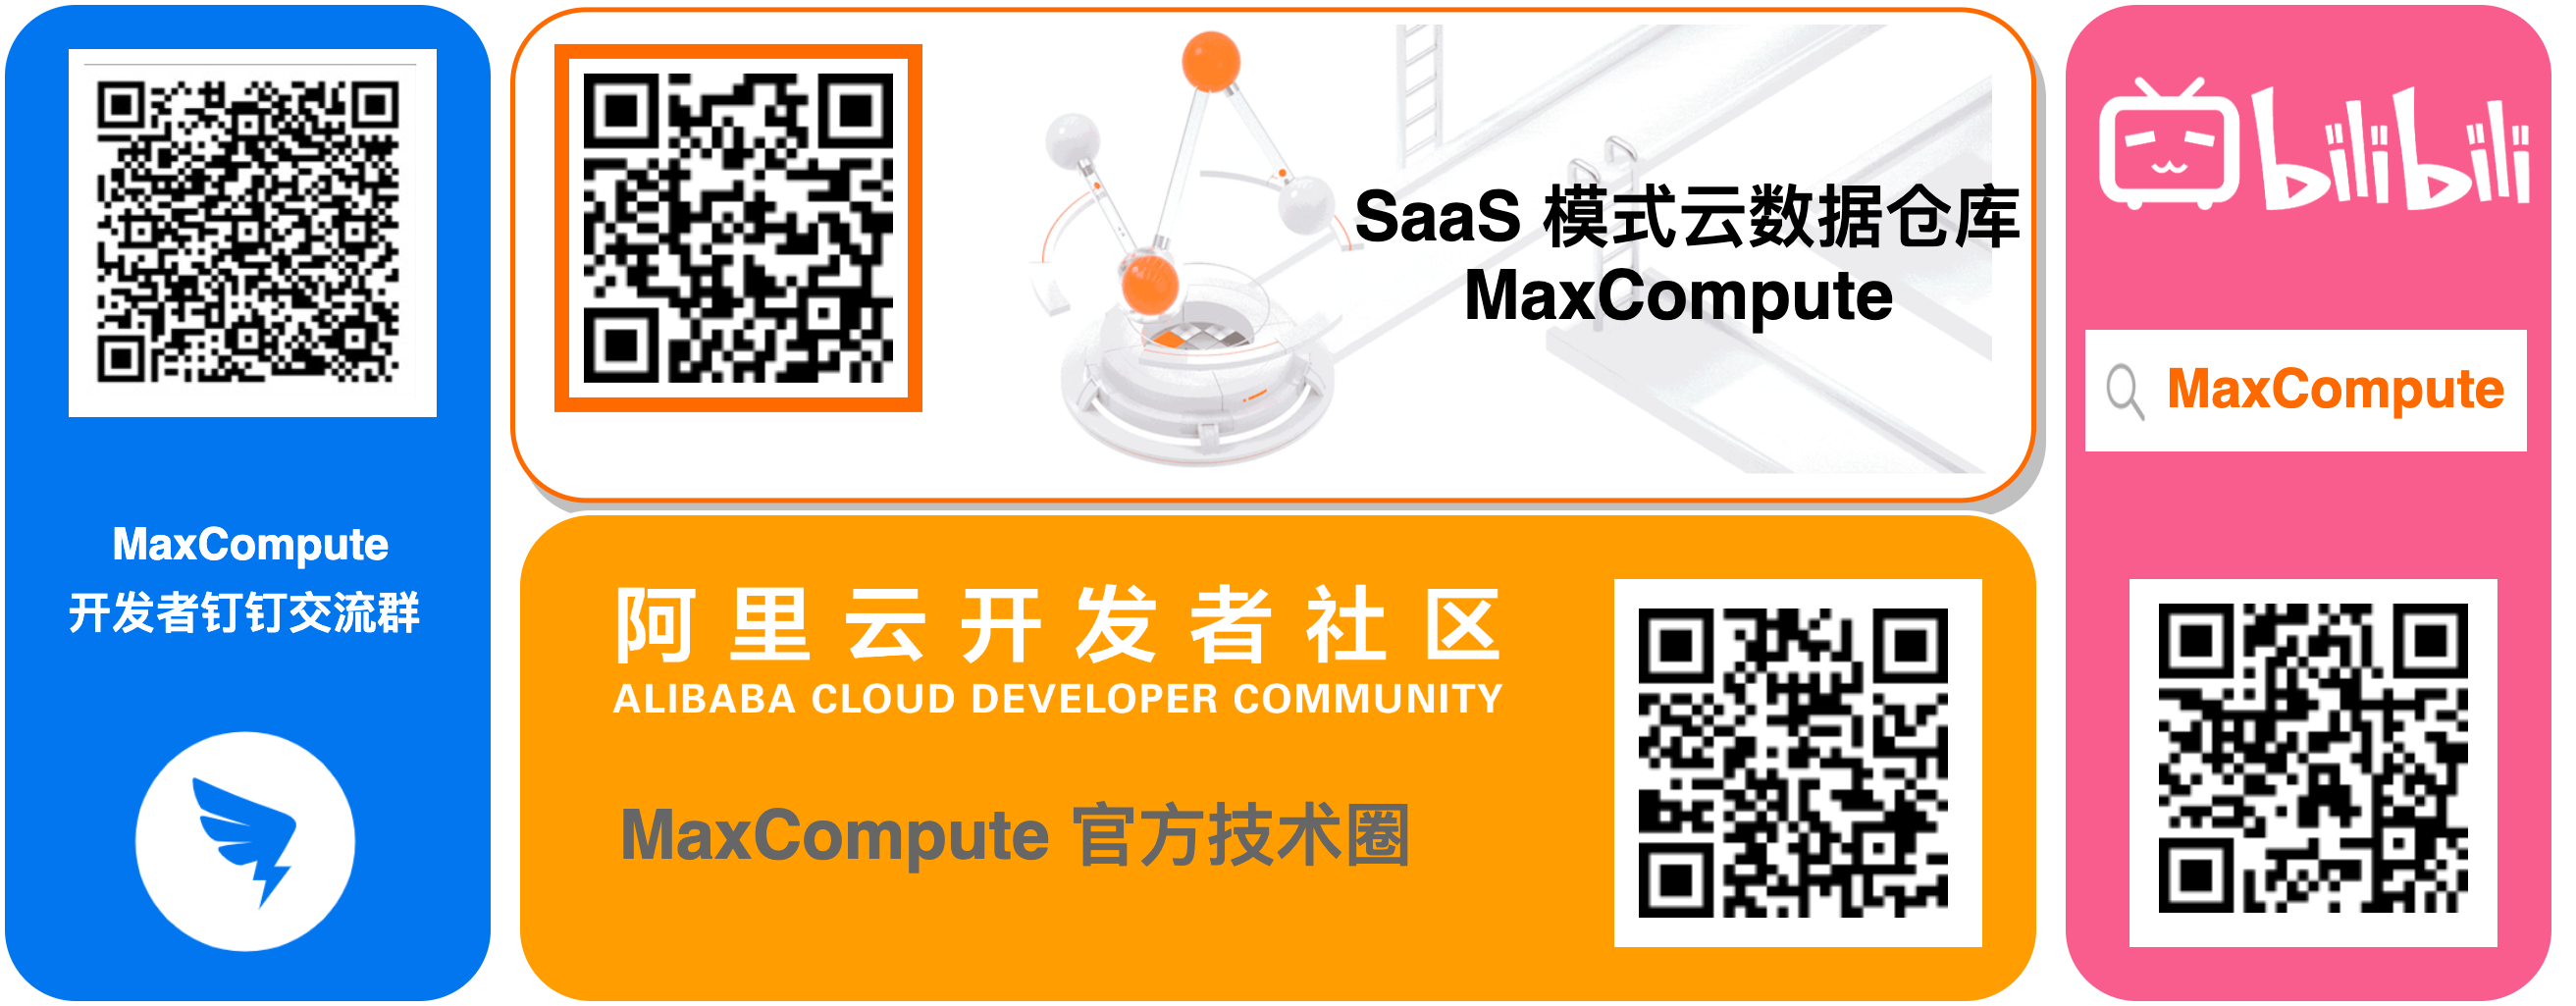 MaxCompute 二维码拼图.png